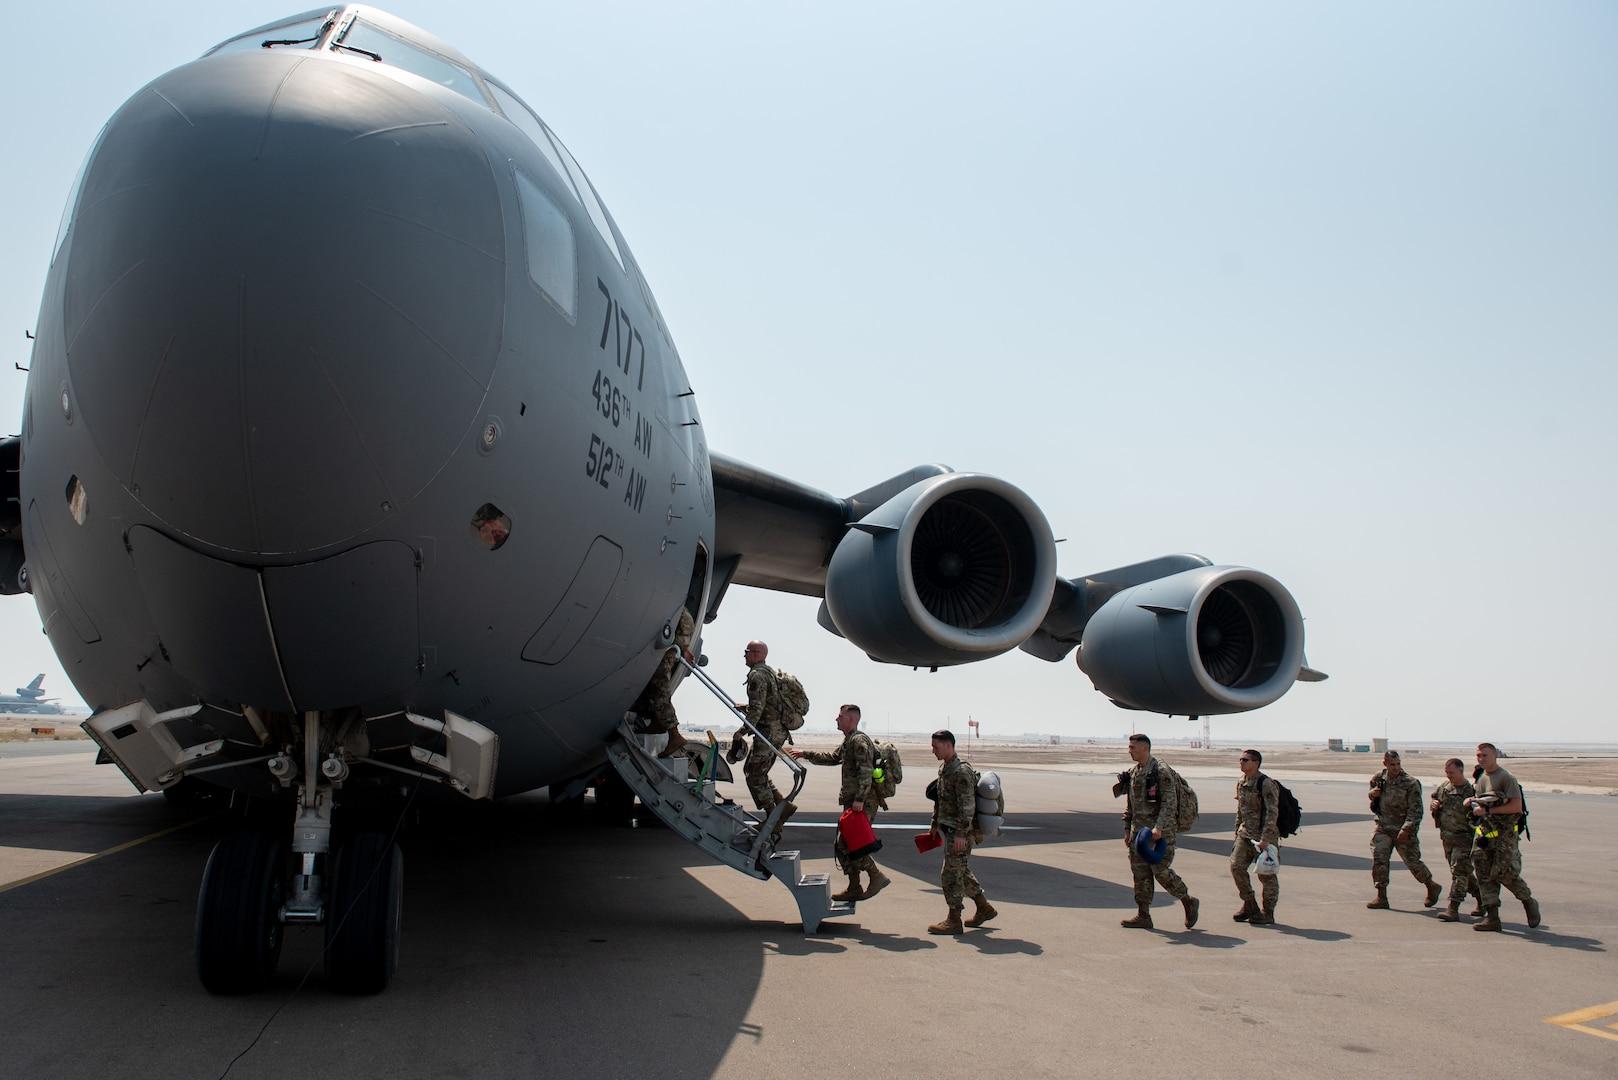 A photo of Airmen boarding a C-17